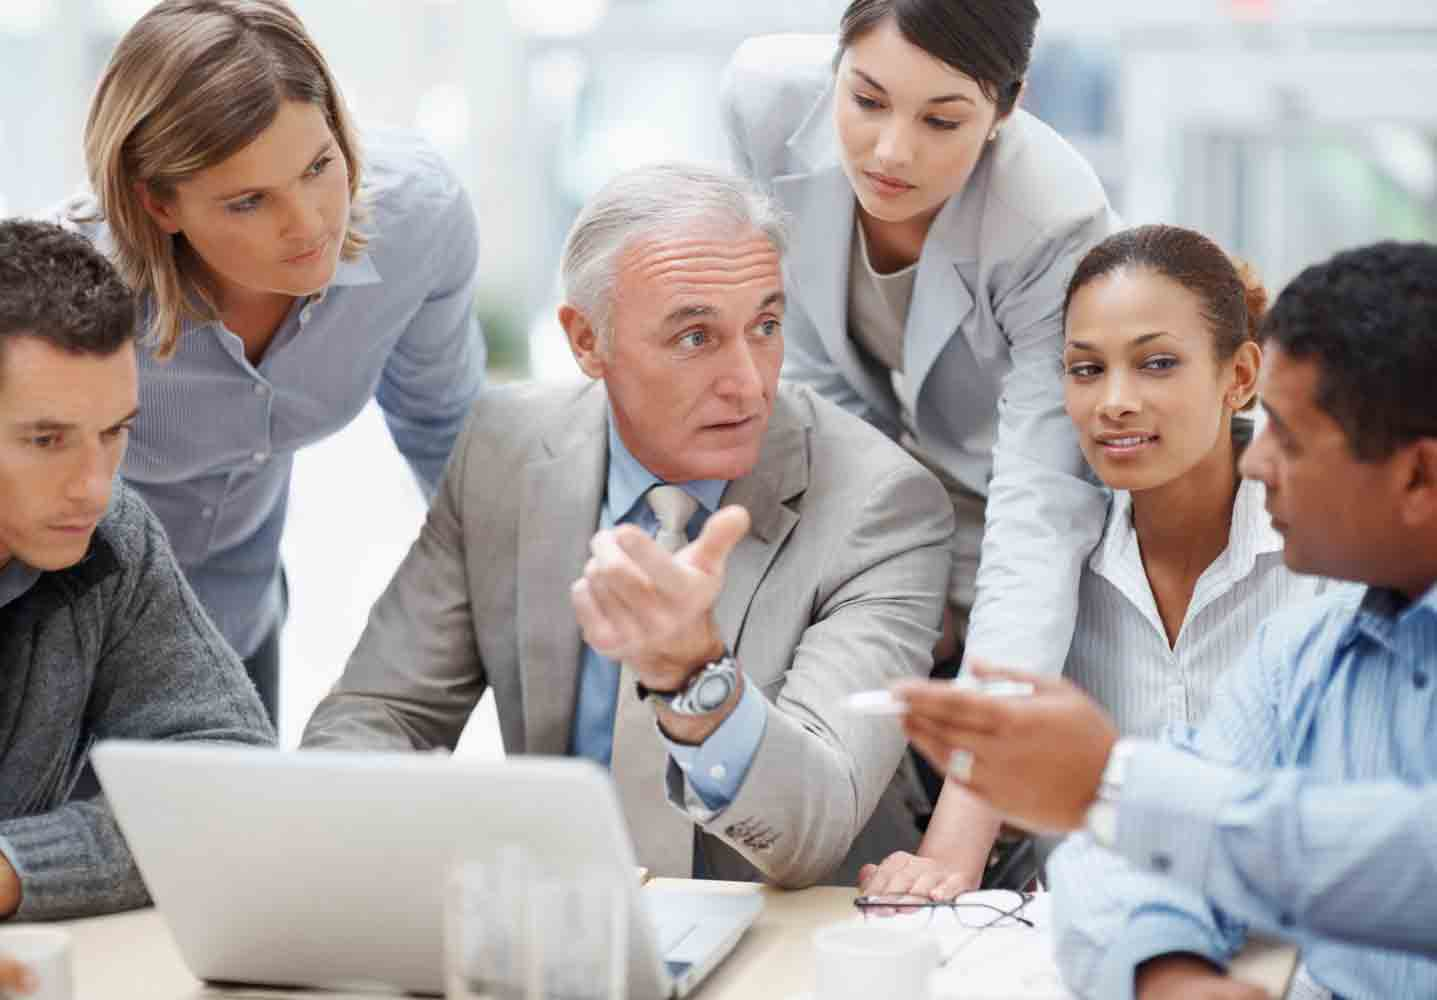 International Business: International Business Meetings